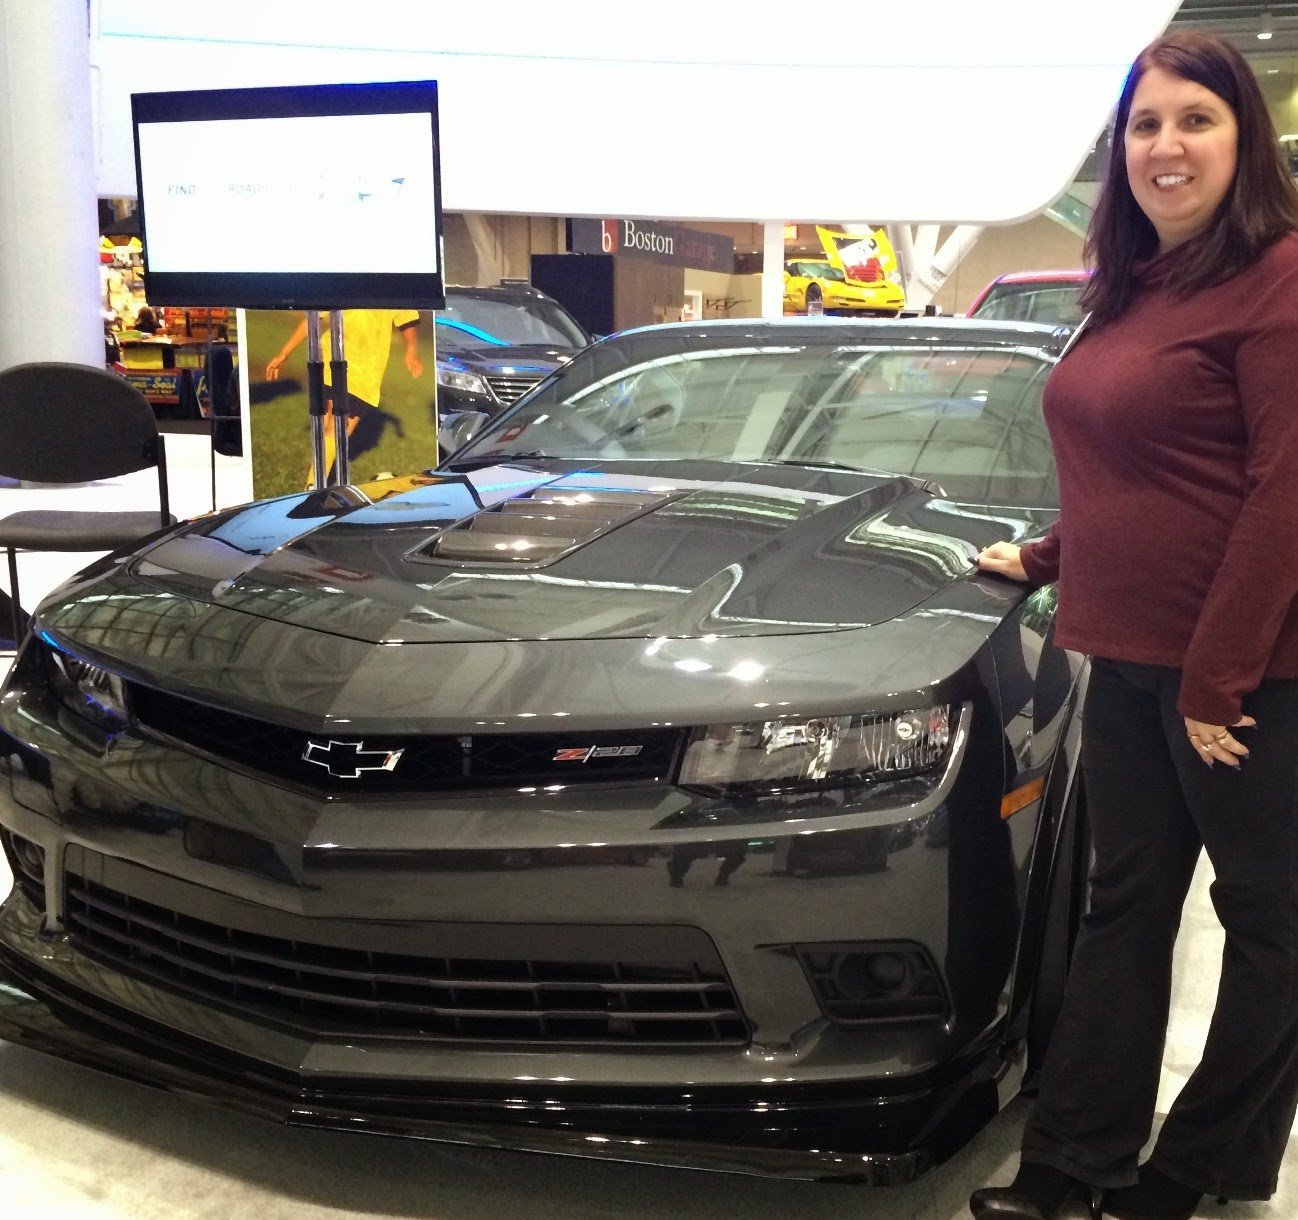 Evan And Lauren's Cool Blog: 1/17/15: Chevrolet And